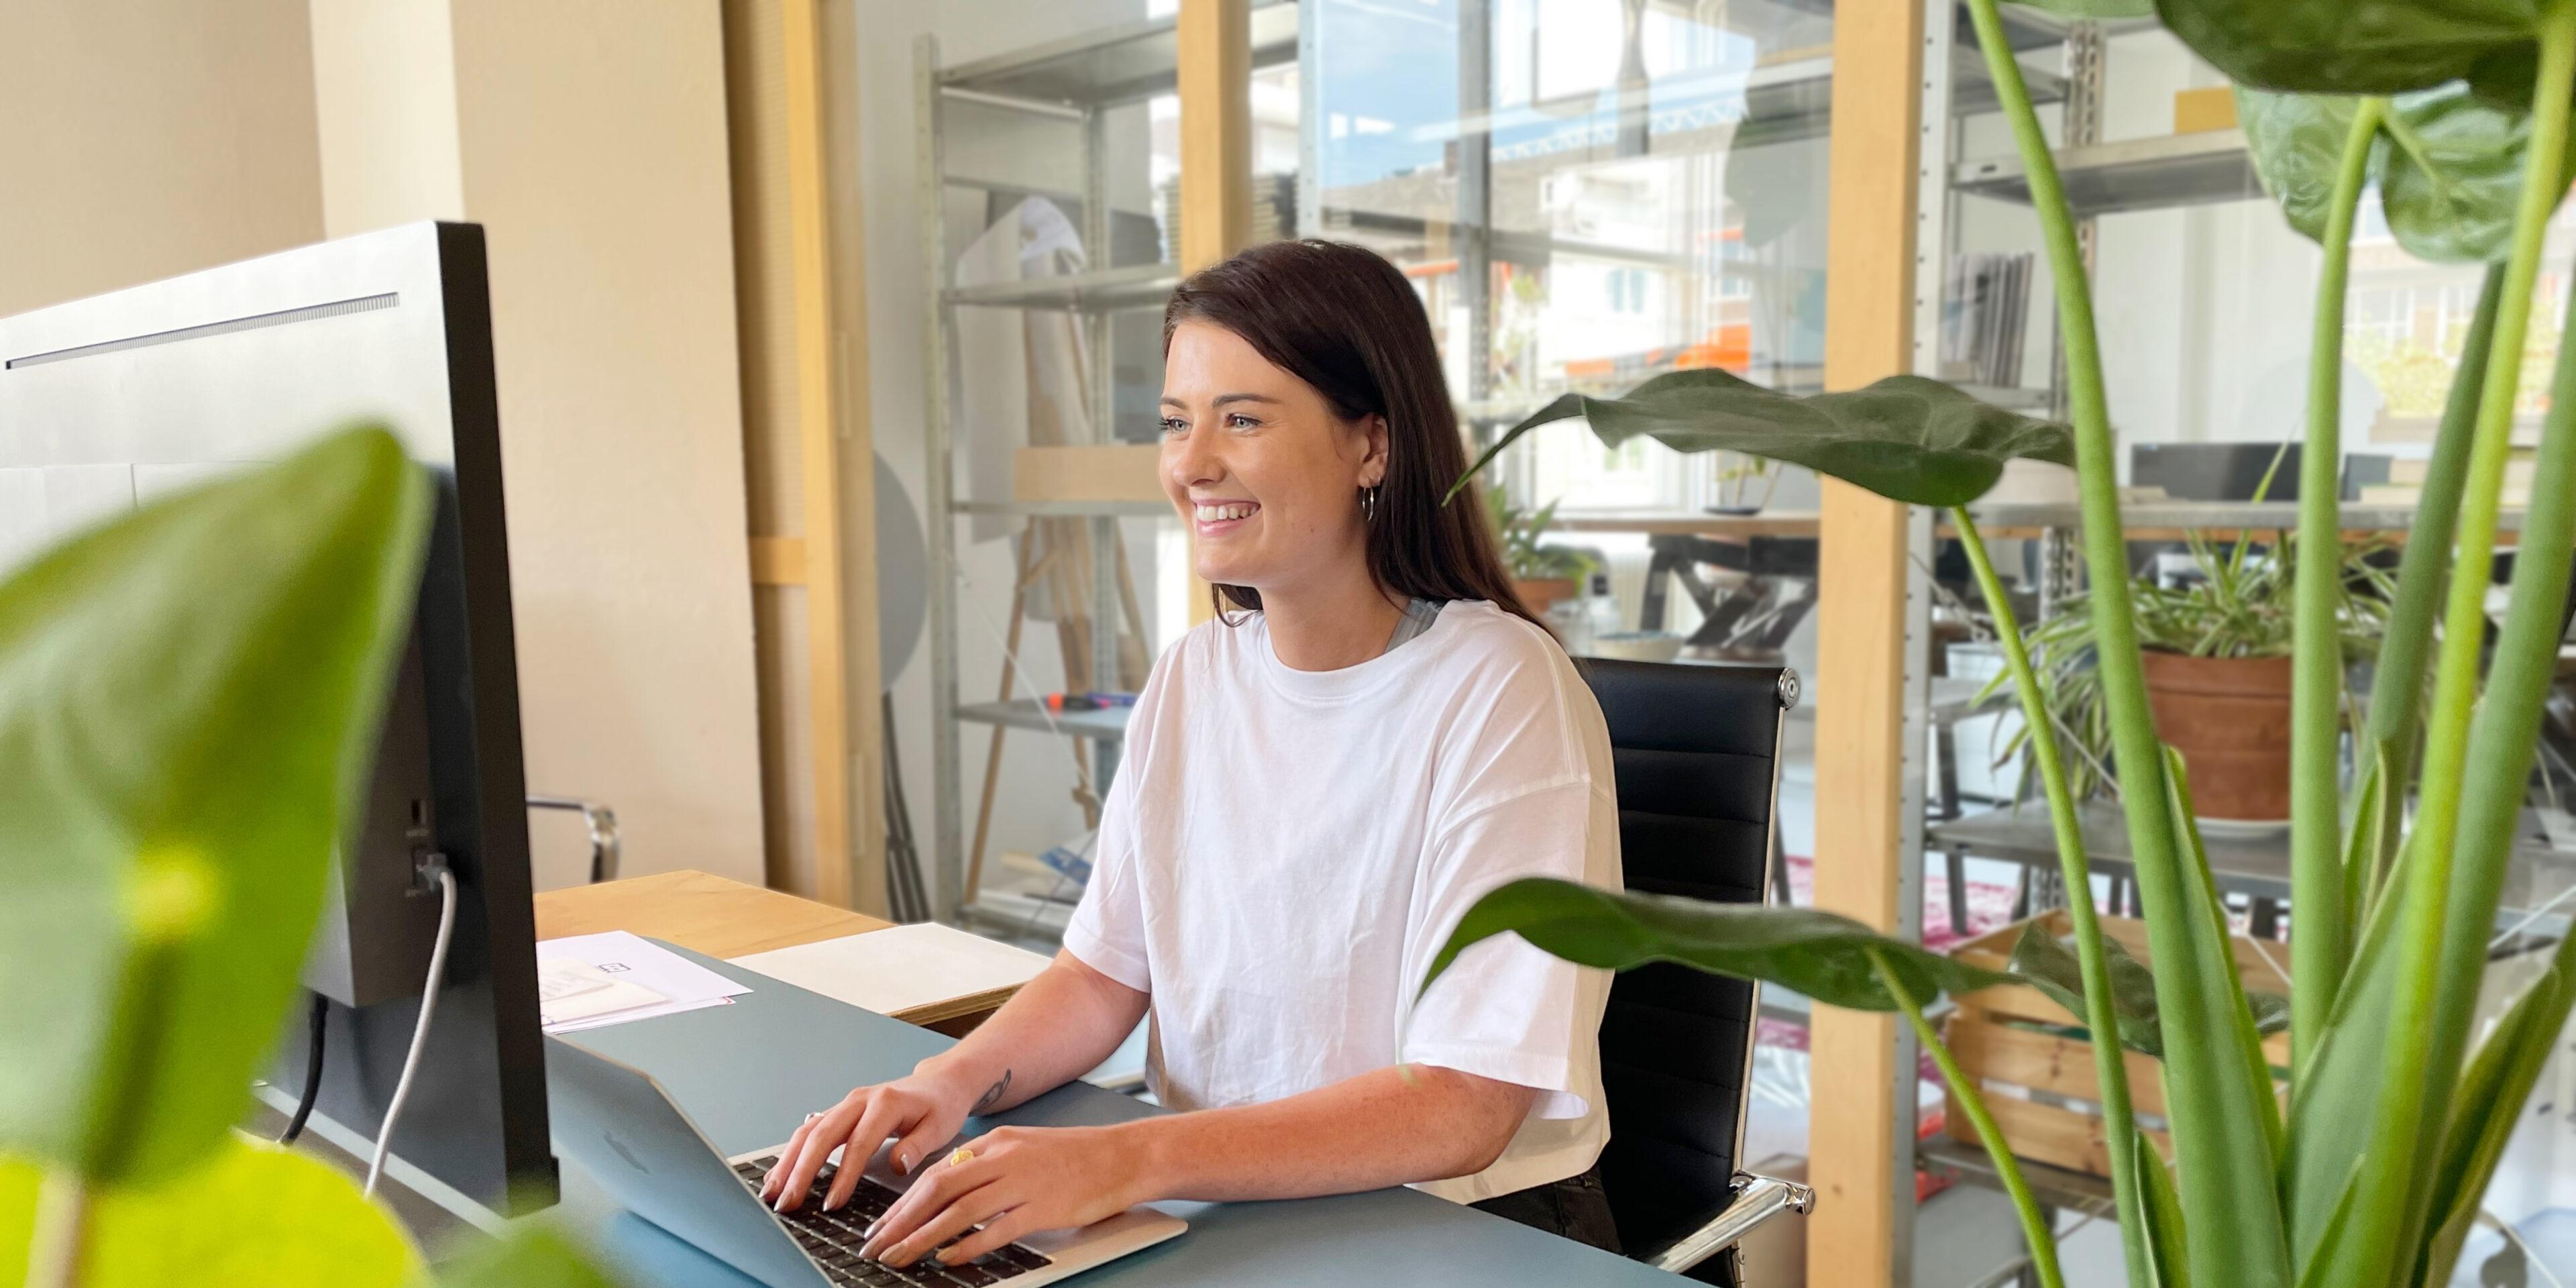 Wild Digital - Meet the Team - Emma Northridge - Front End Developer